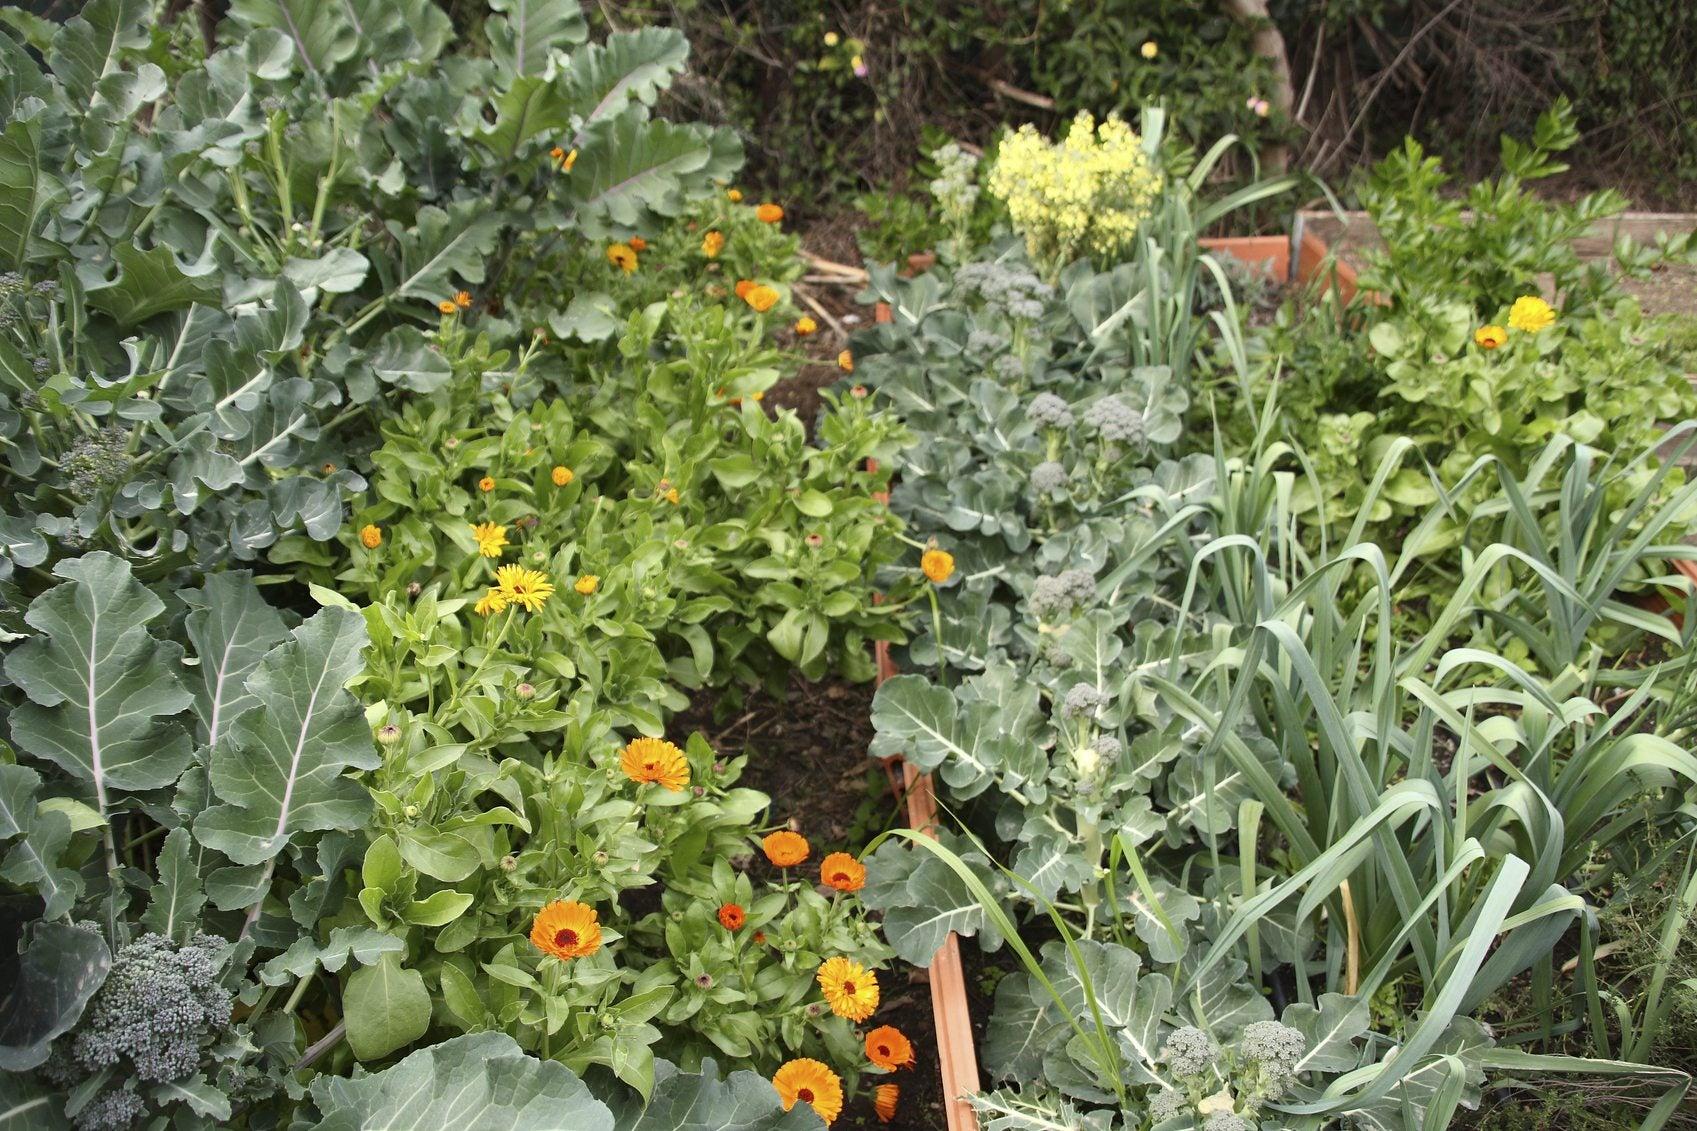 Broccoli Companion Plants What Should You Plant Next To Broccoli